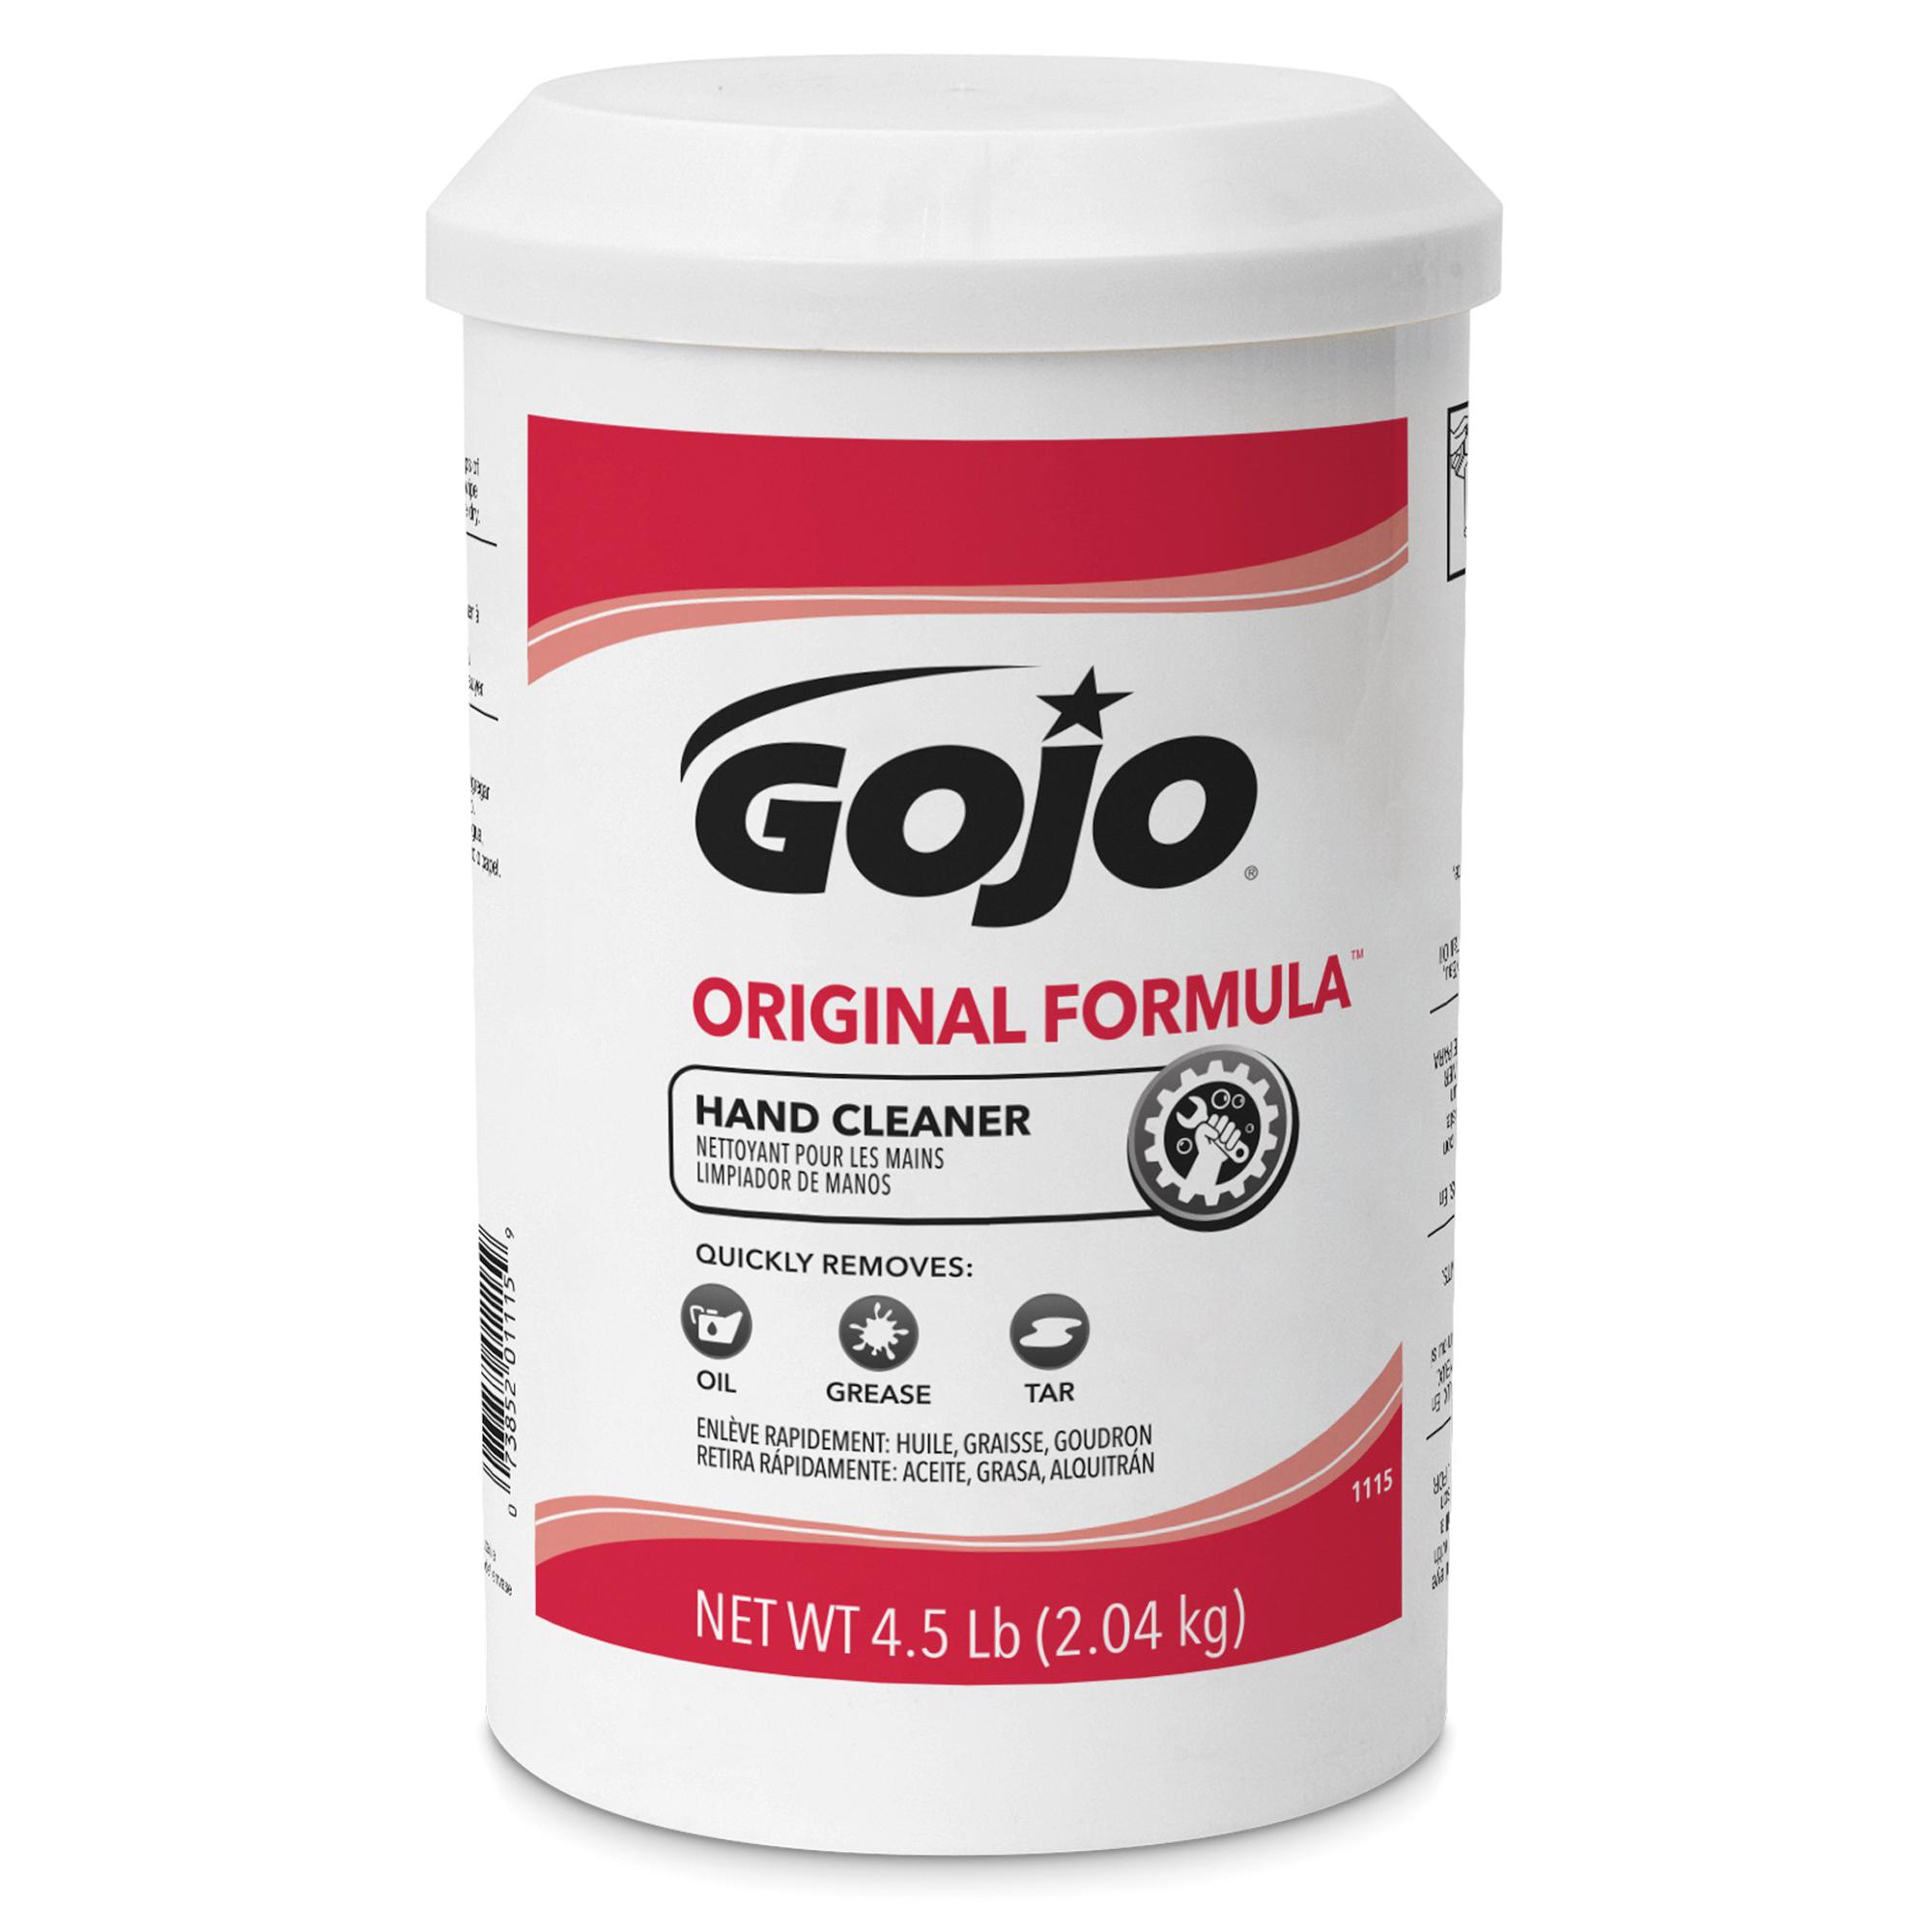 GOJO® 1109-12 ORIGINAL FORMULA™ Hand Cleaner, 14 oz Nominal, Plastic Cartridge Package, Creamy Form, Solvent Odor/Scent, Opaque White